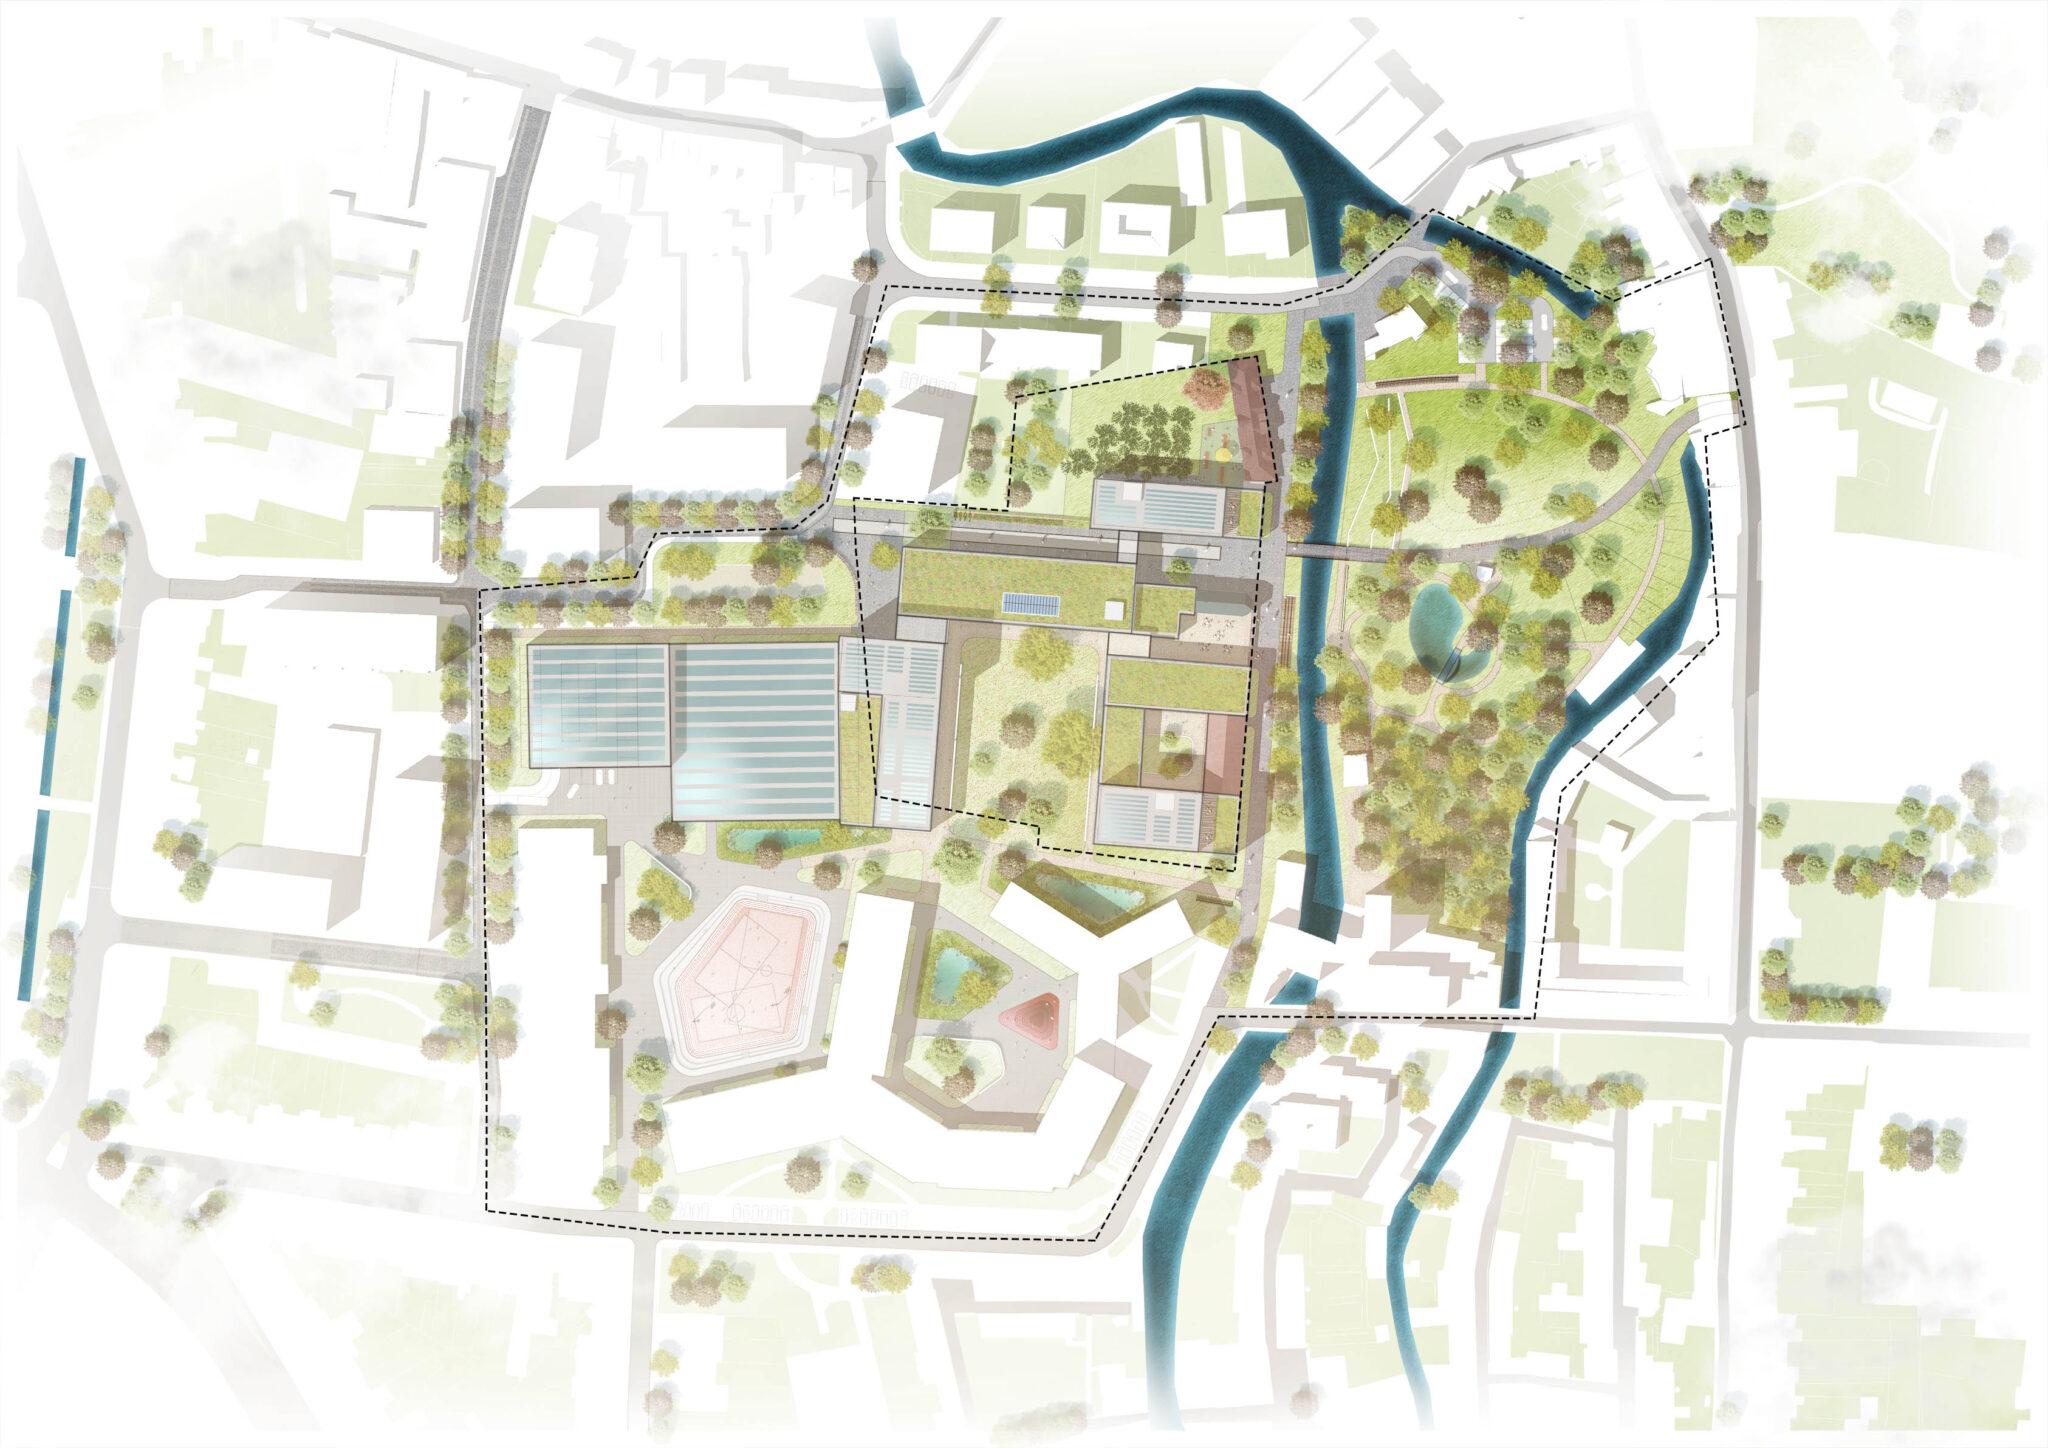 Redingensite Leuven - RAU Architects - Presentation plan